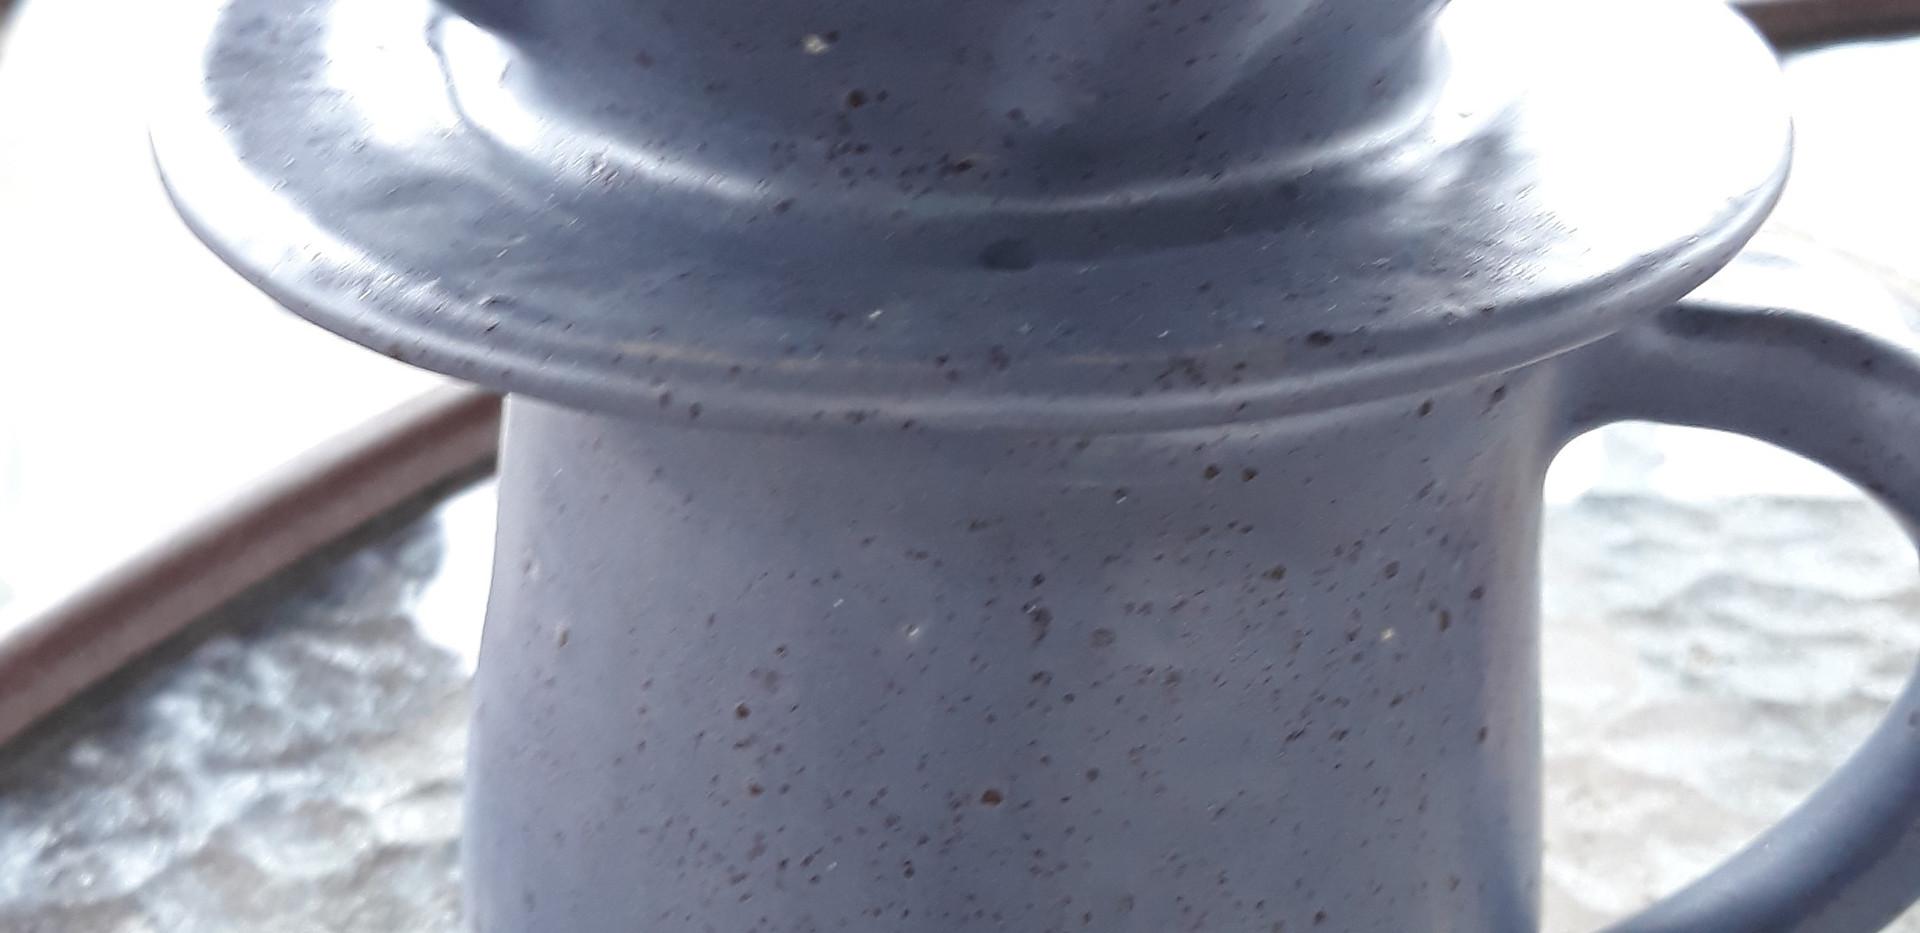 Early Bird - Ceramic mug, coaster, and coffee pour over